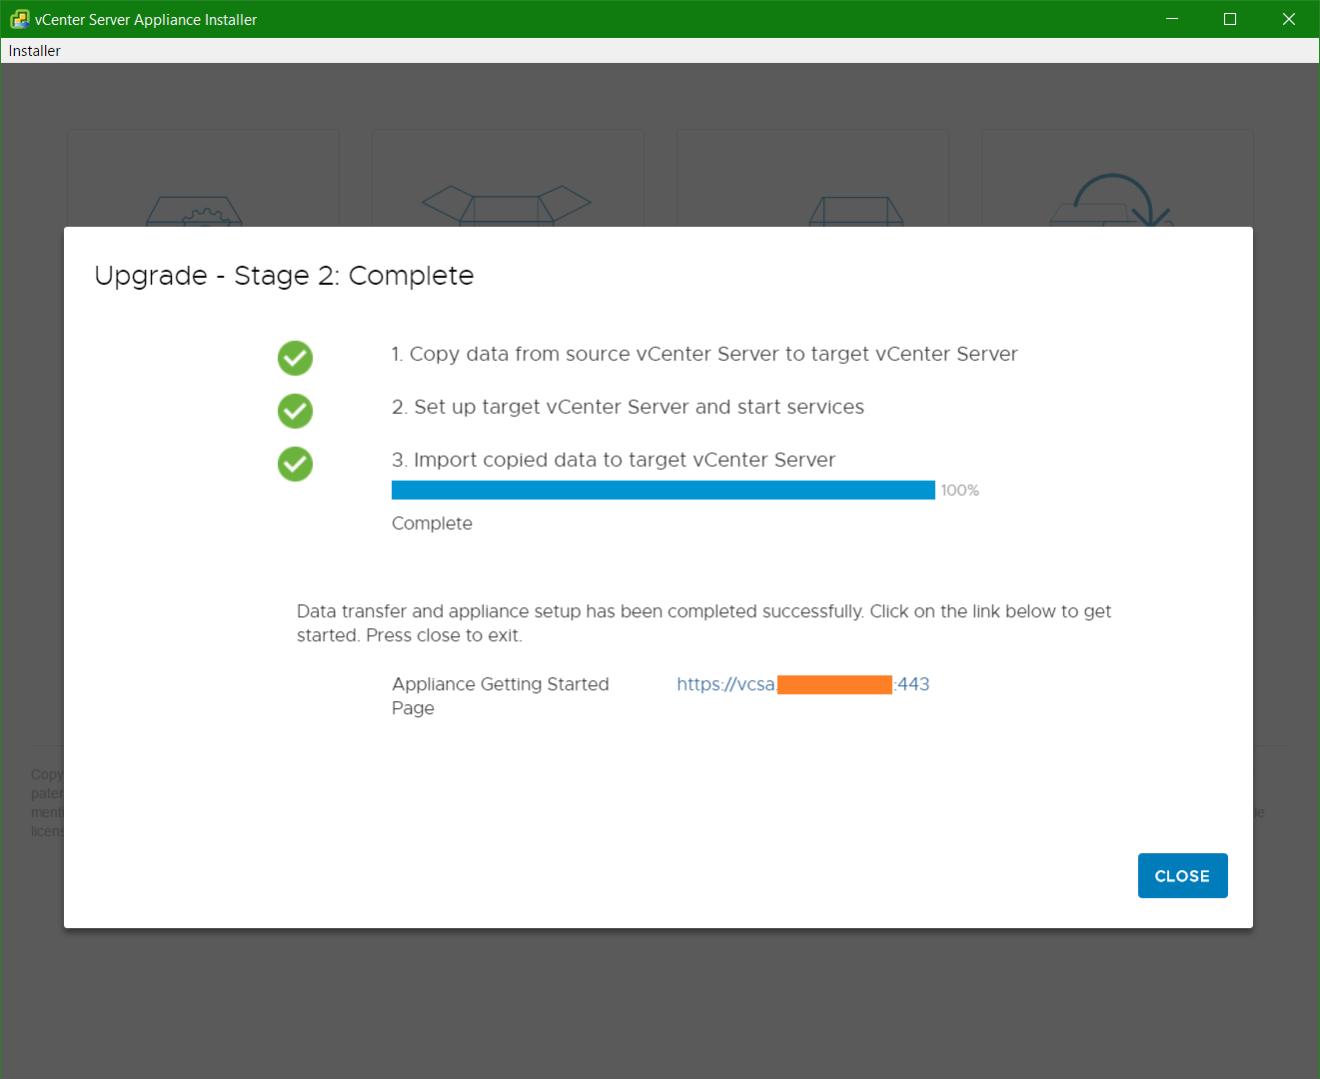 domalab.com vmware vcsa upgrade stage 2 import data